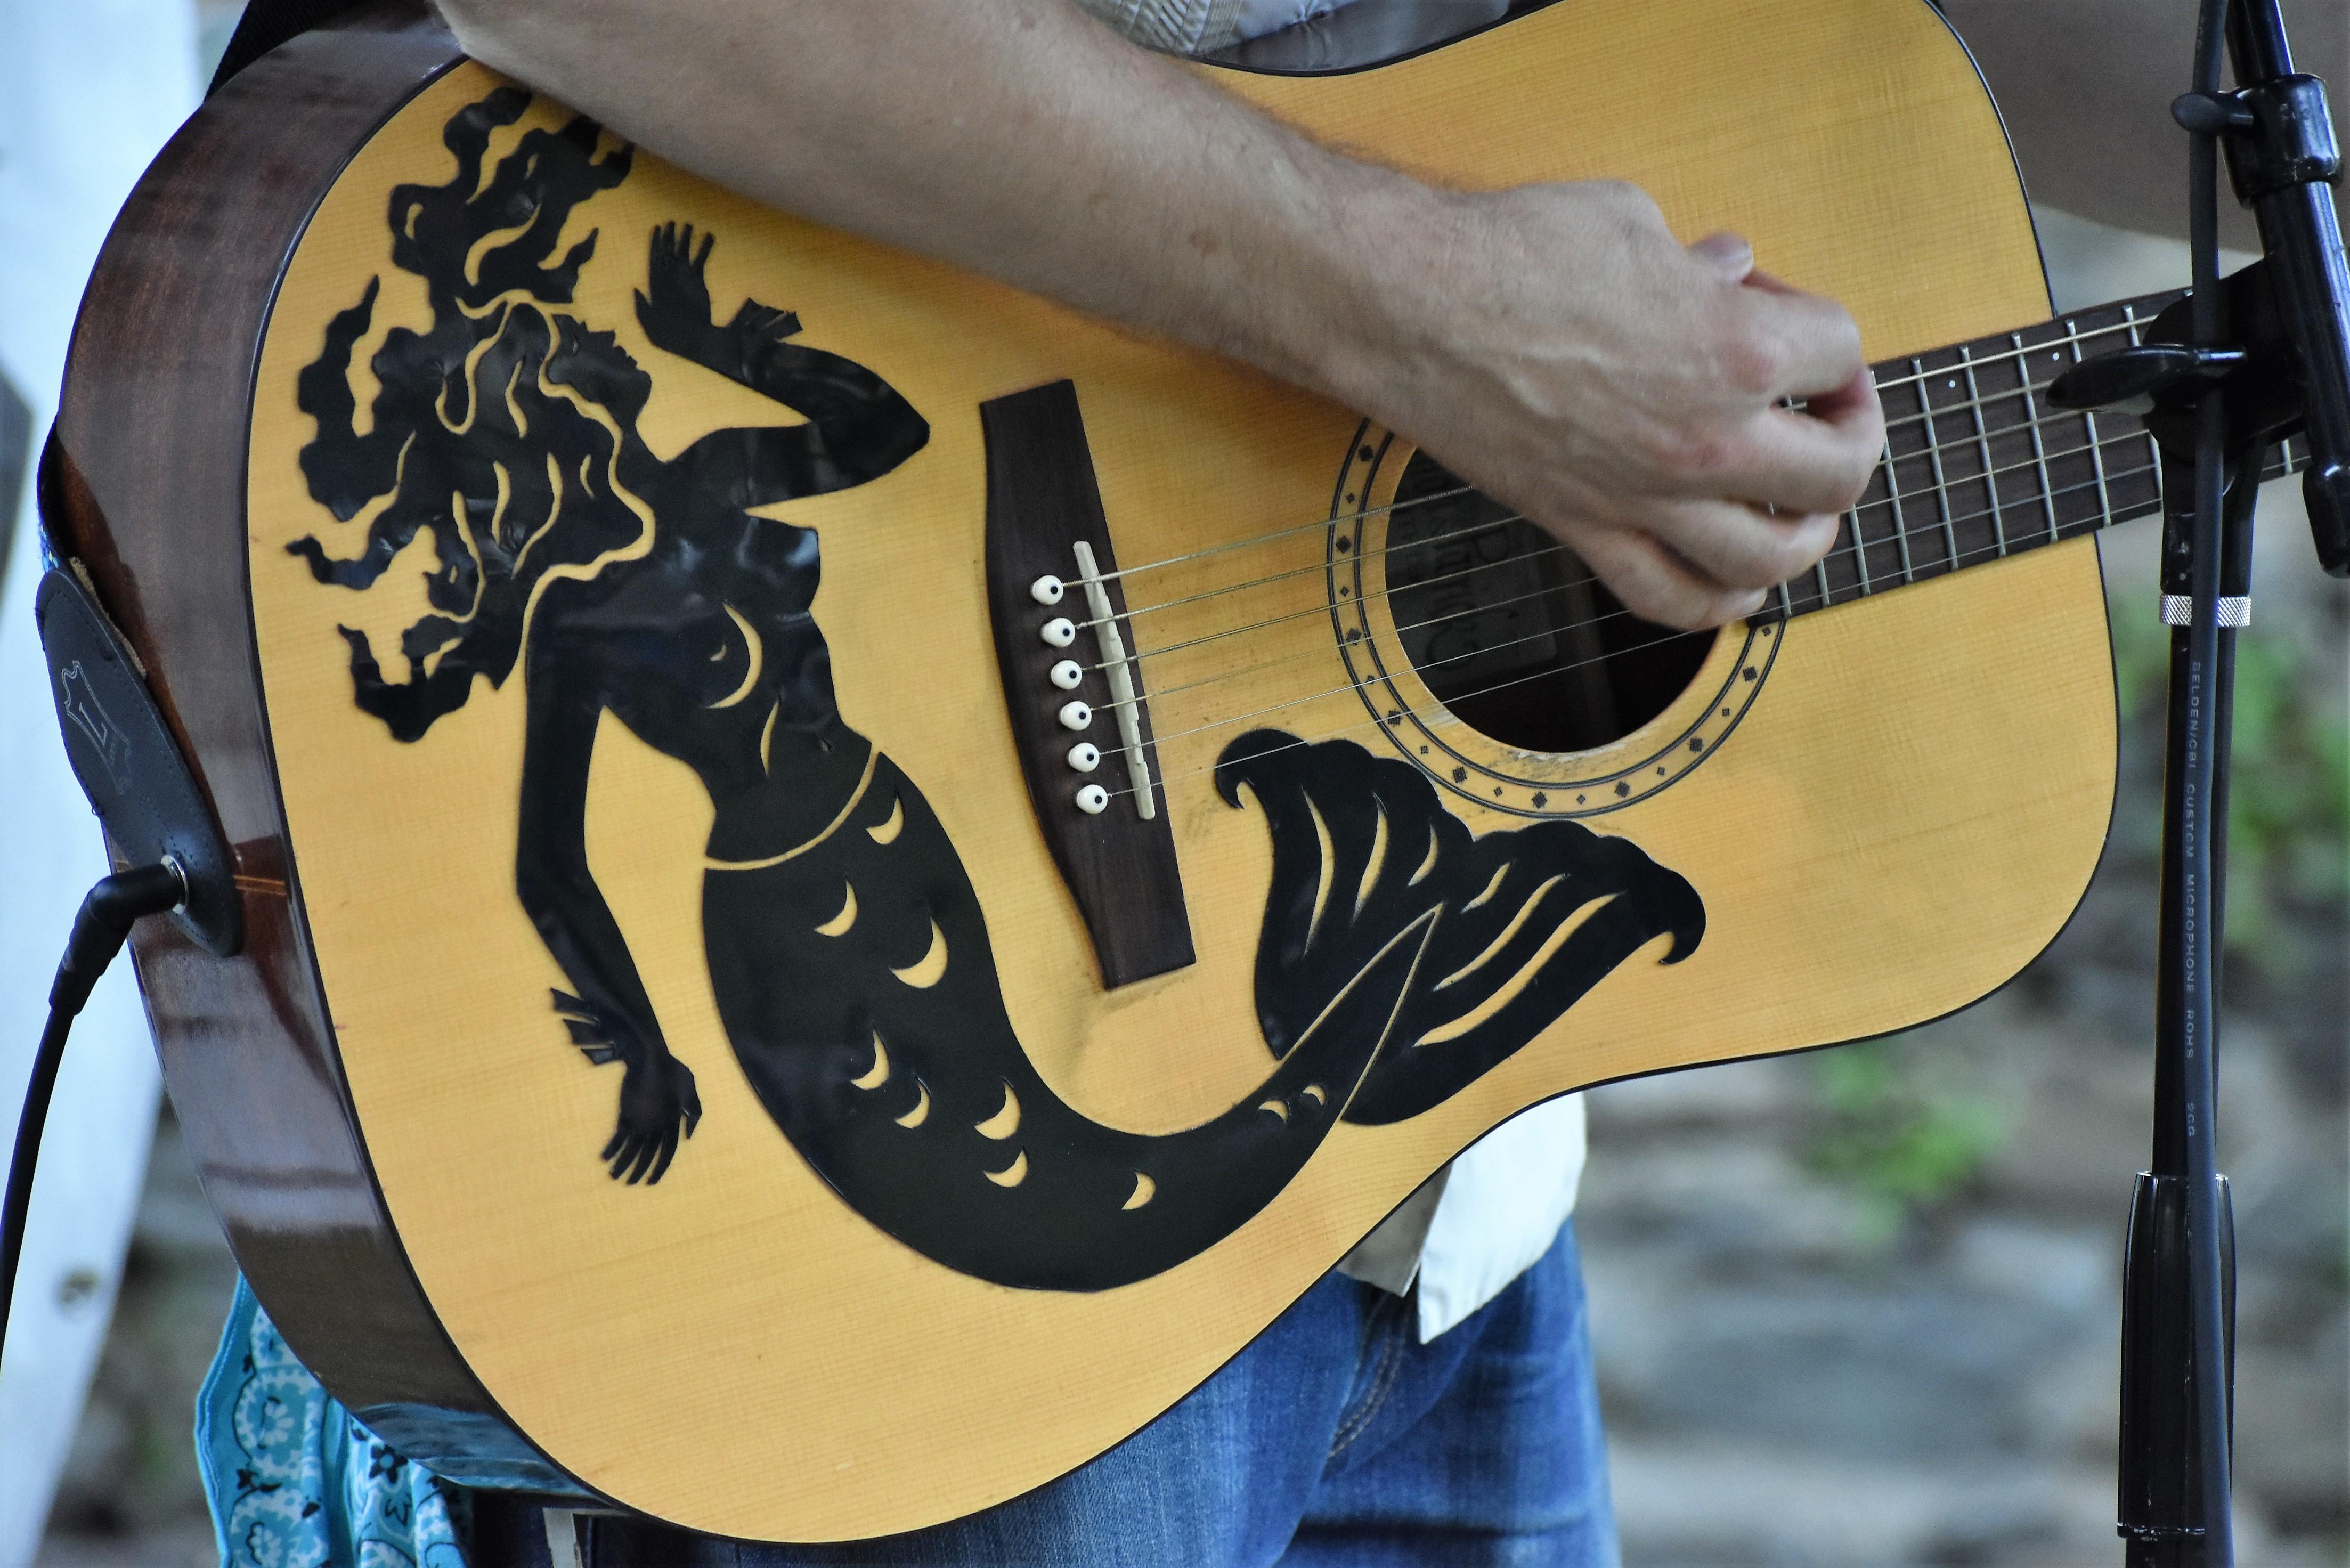 Wicked Rhody: (8/23/19 – 8/25/19) – The Providence Folk Festival